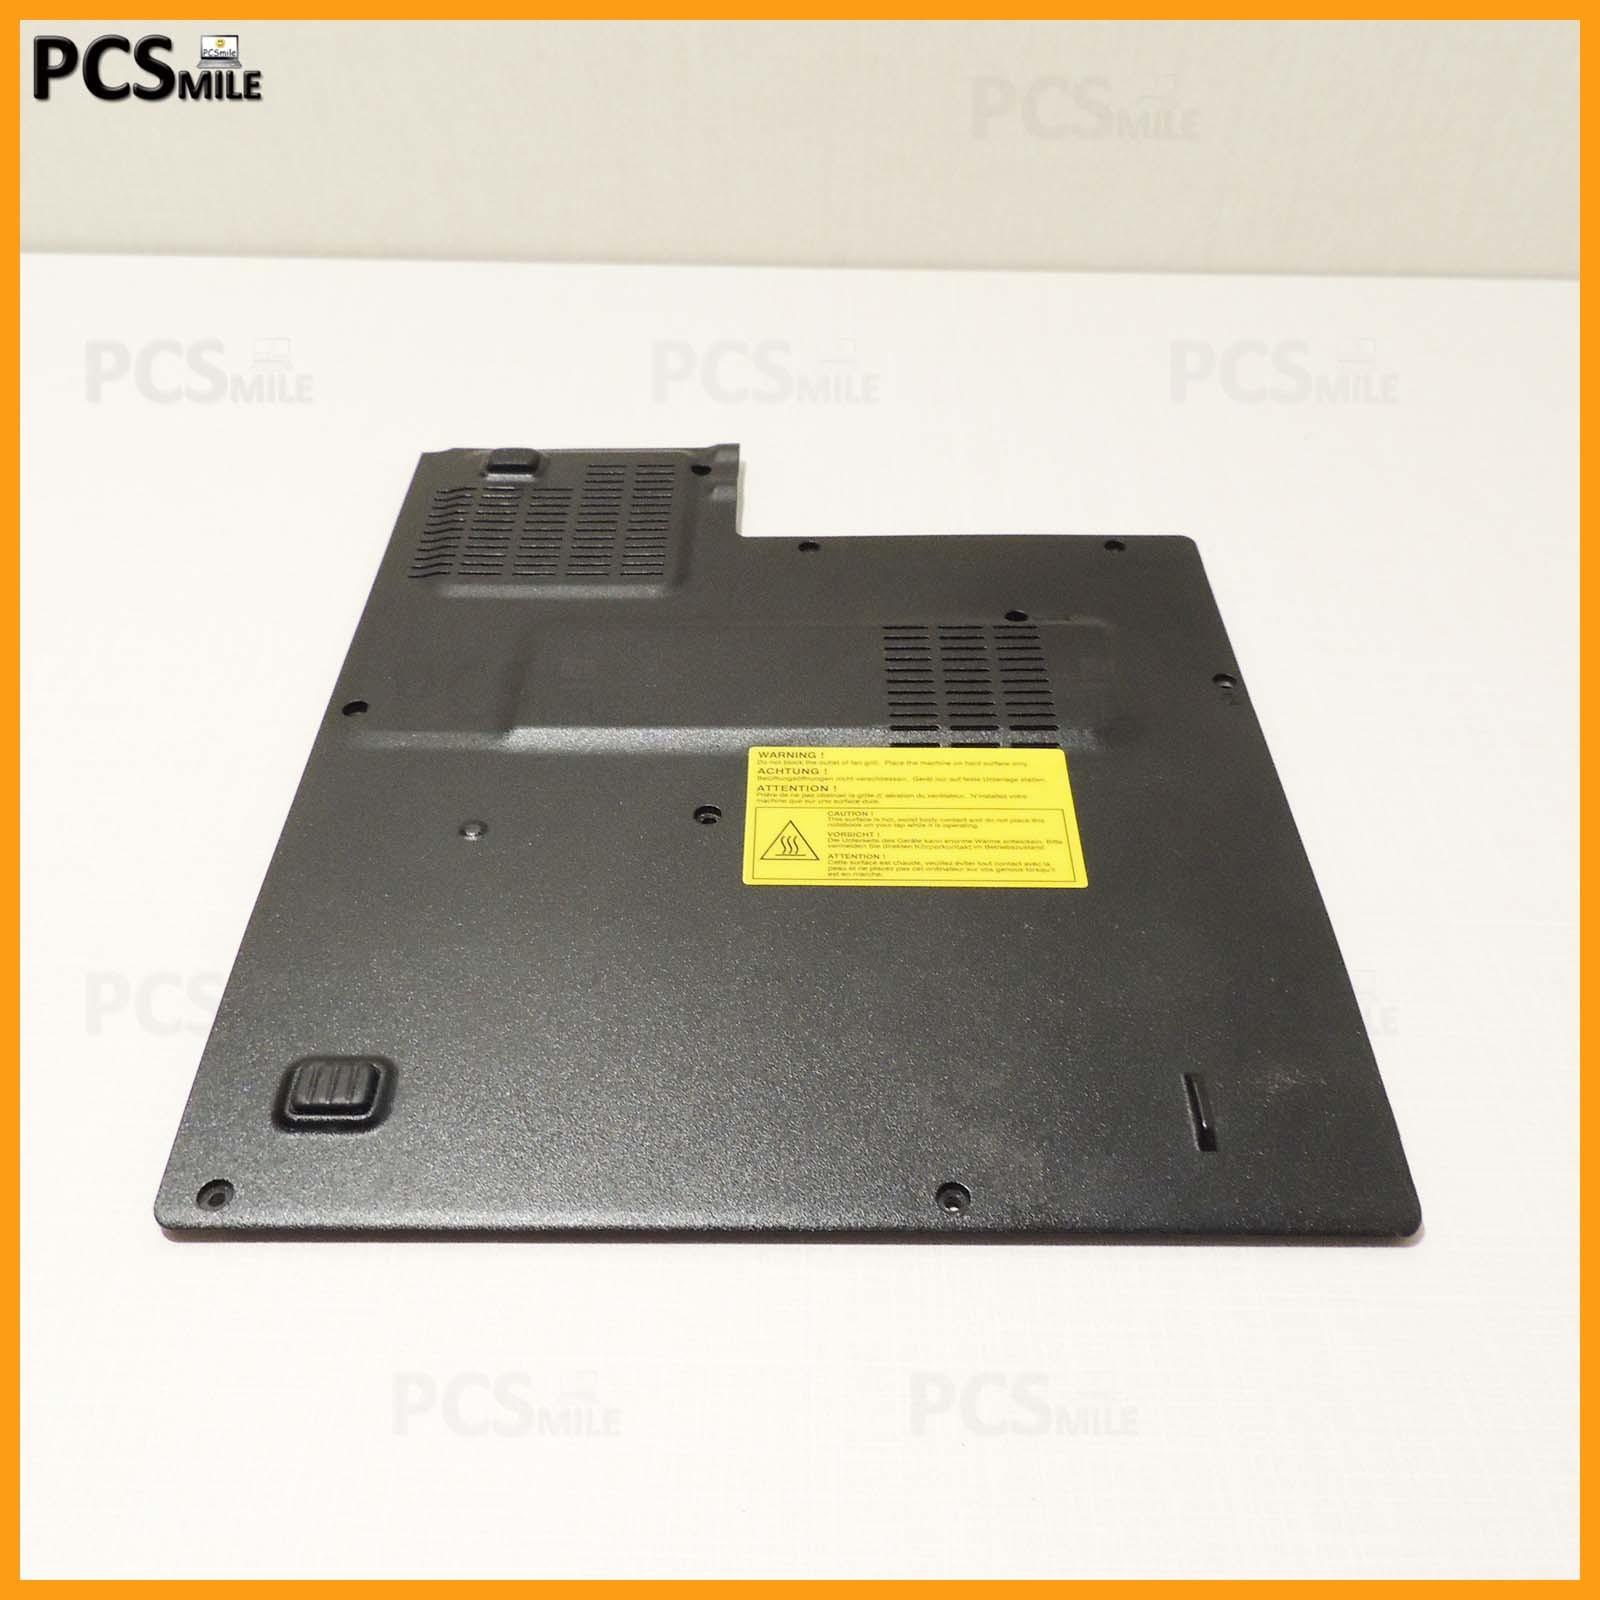 Scocca tappo HD RAM Ventola Amilo Pi 1505 BS032 Fujitsu Siemens 83GL50092-00 REV:00